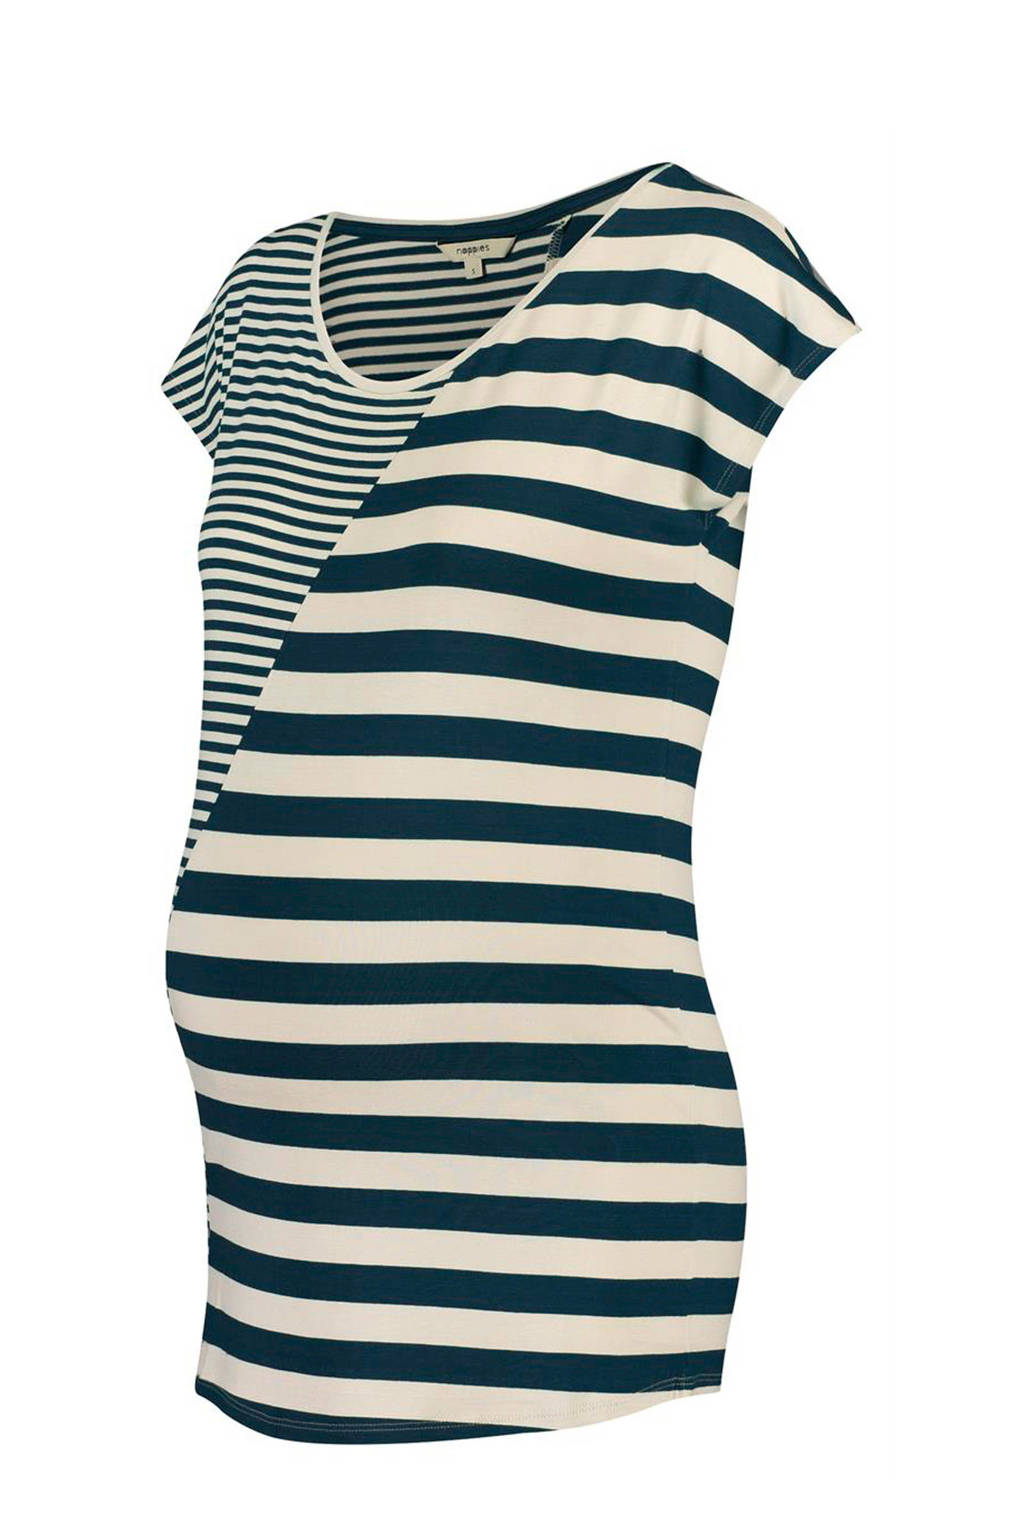 Noppies gestreept zwangerschaps T-shirt Pearle blauw, Donkerblauw/ecru